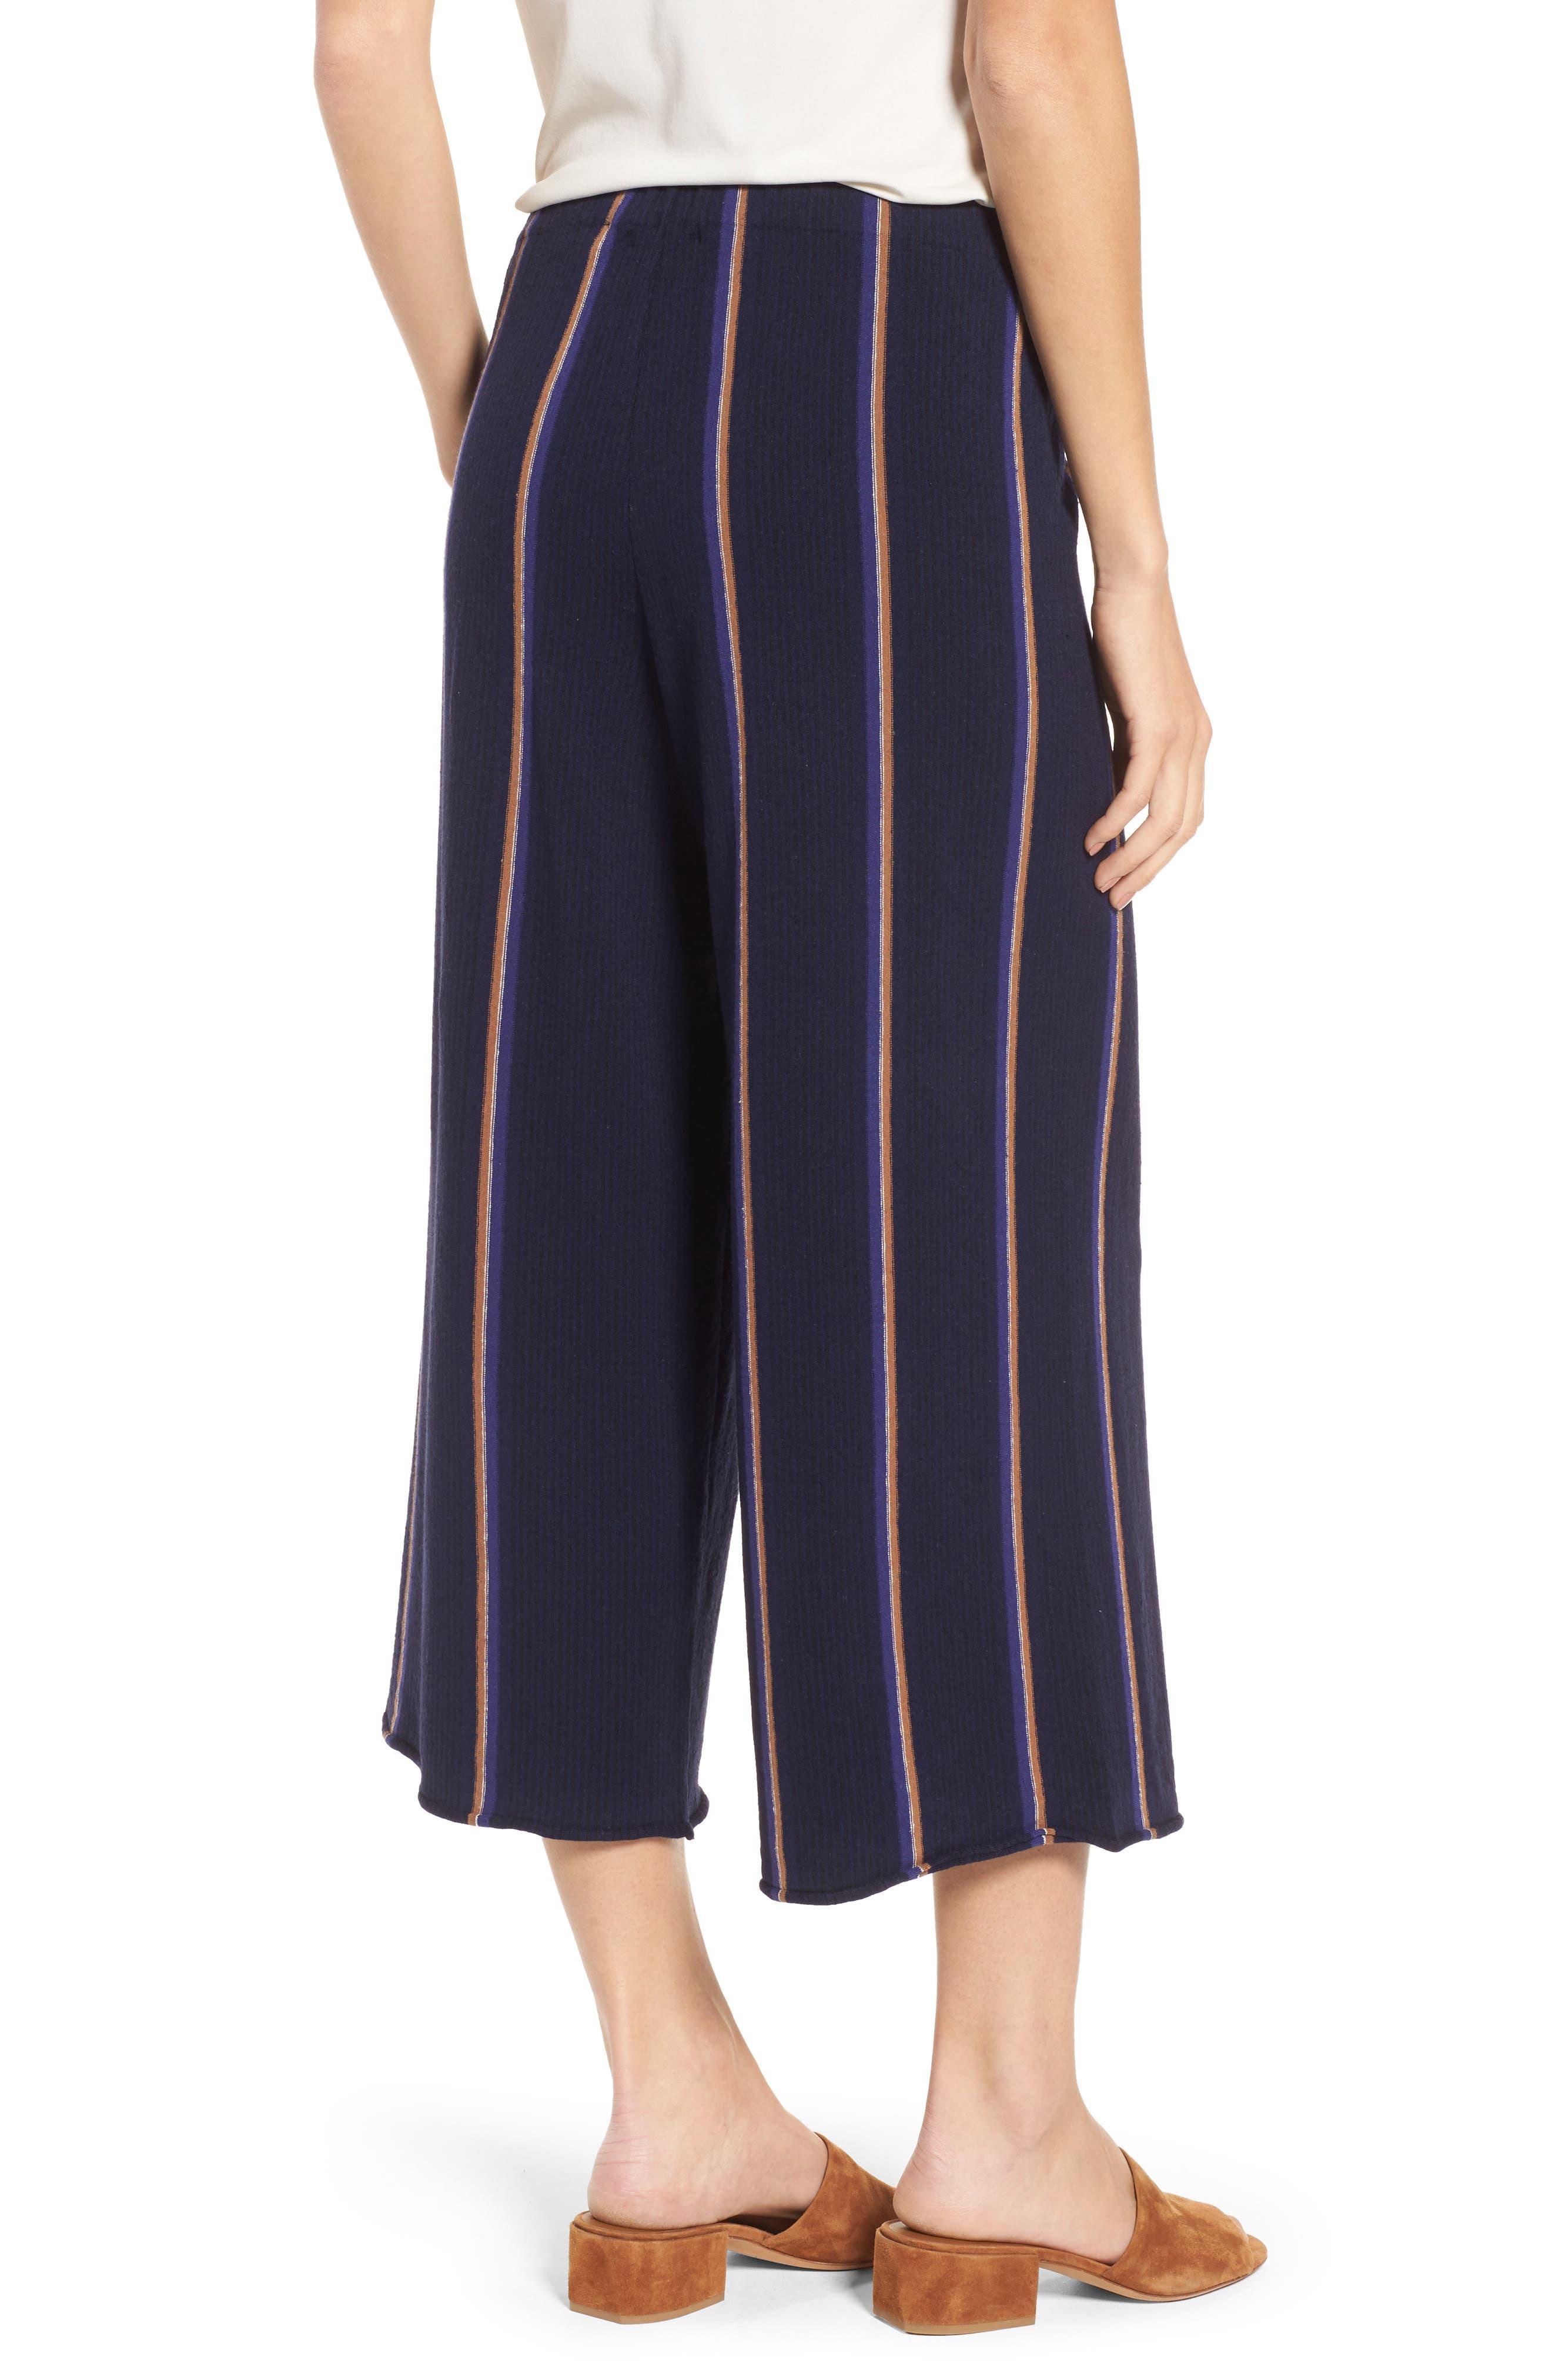 Lined Up Knit Pants,                             Alternate thumbnail 2, color,                             Blue Multi